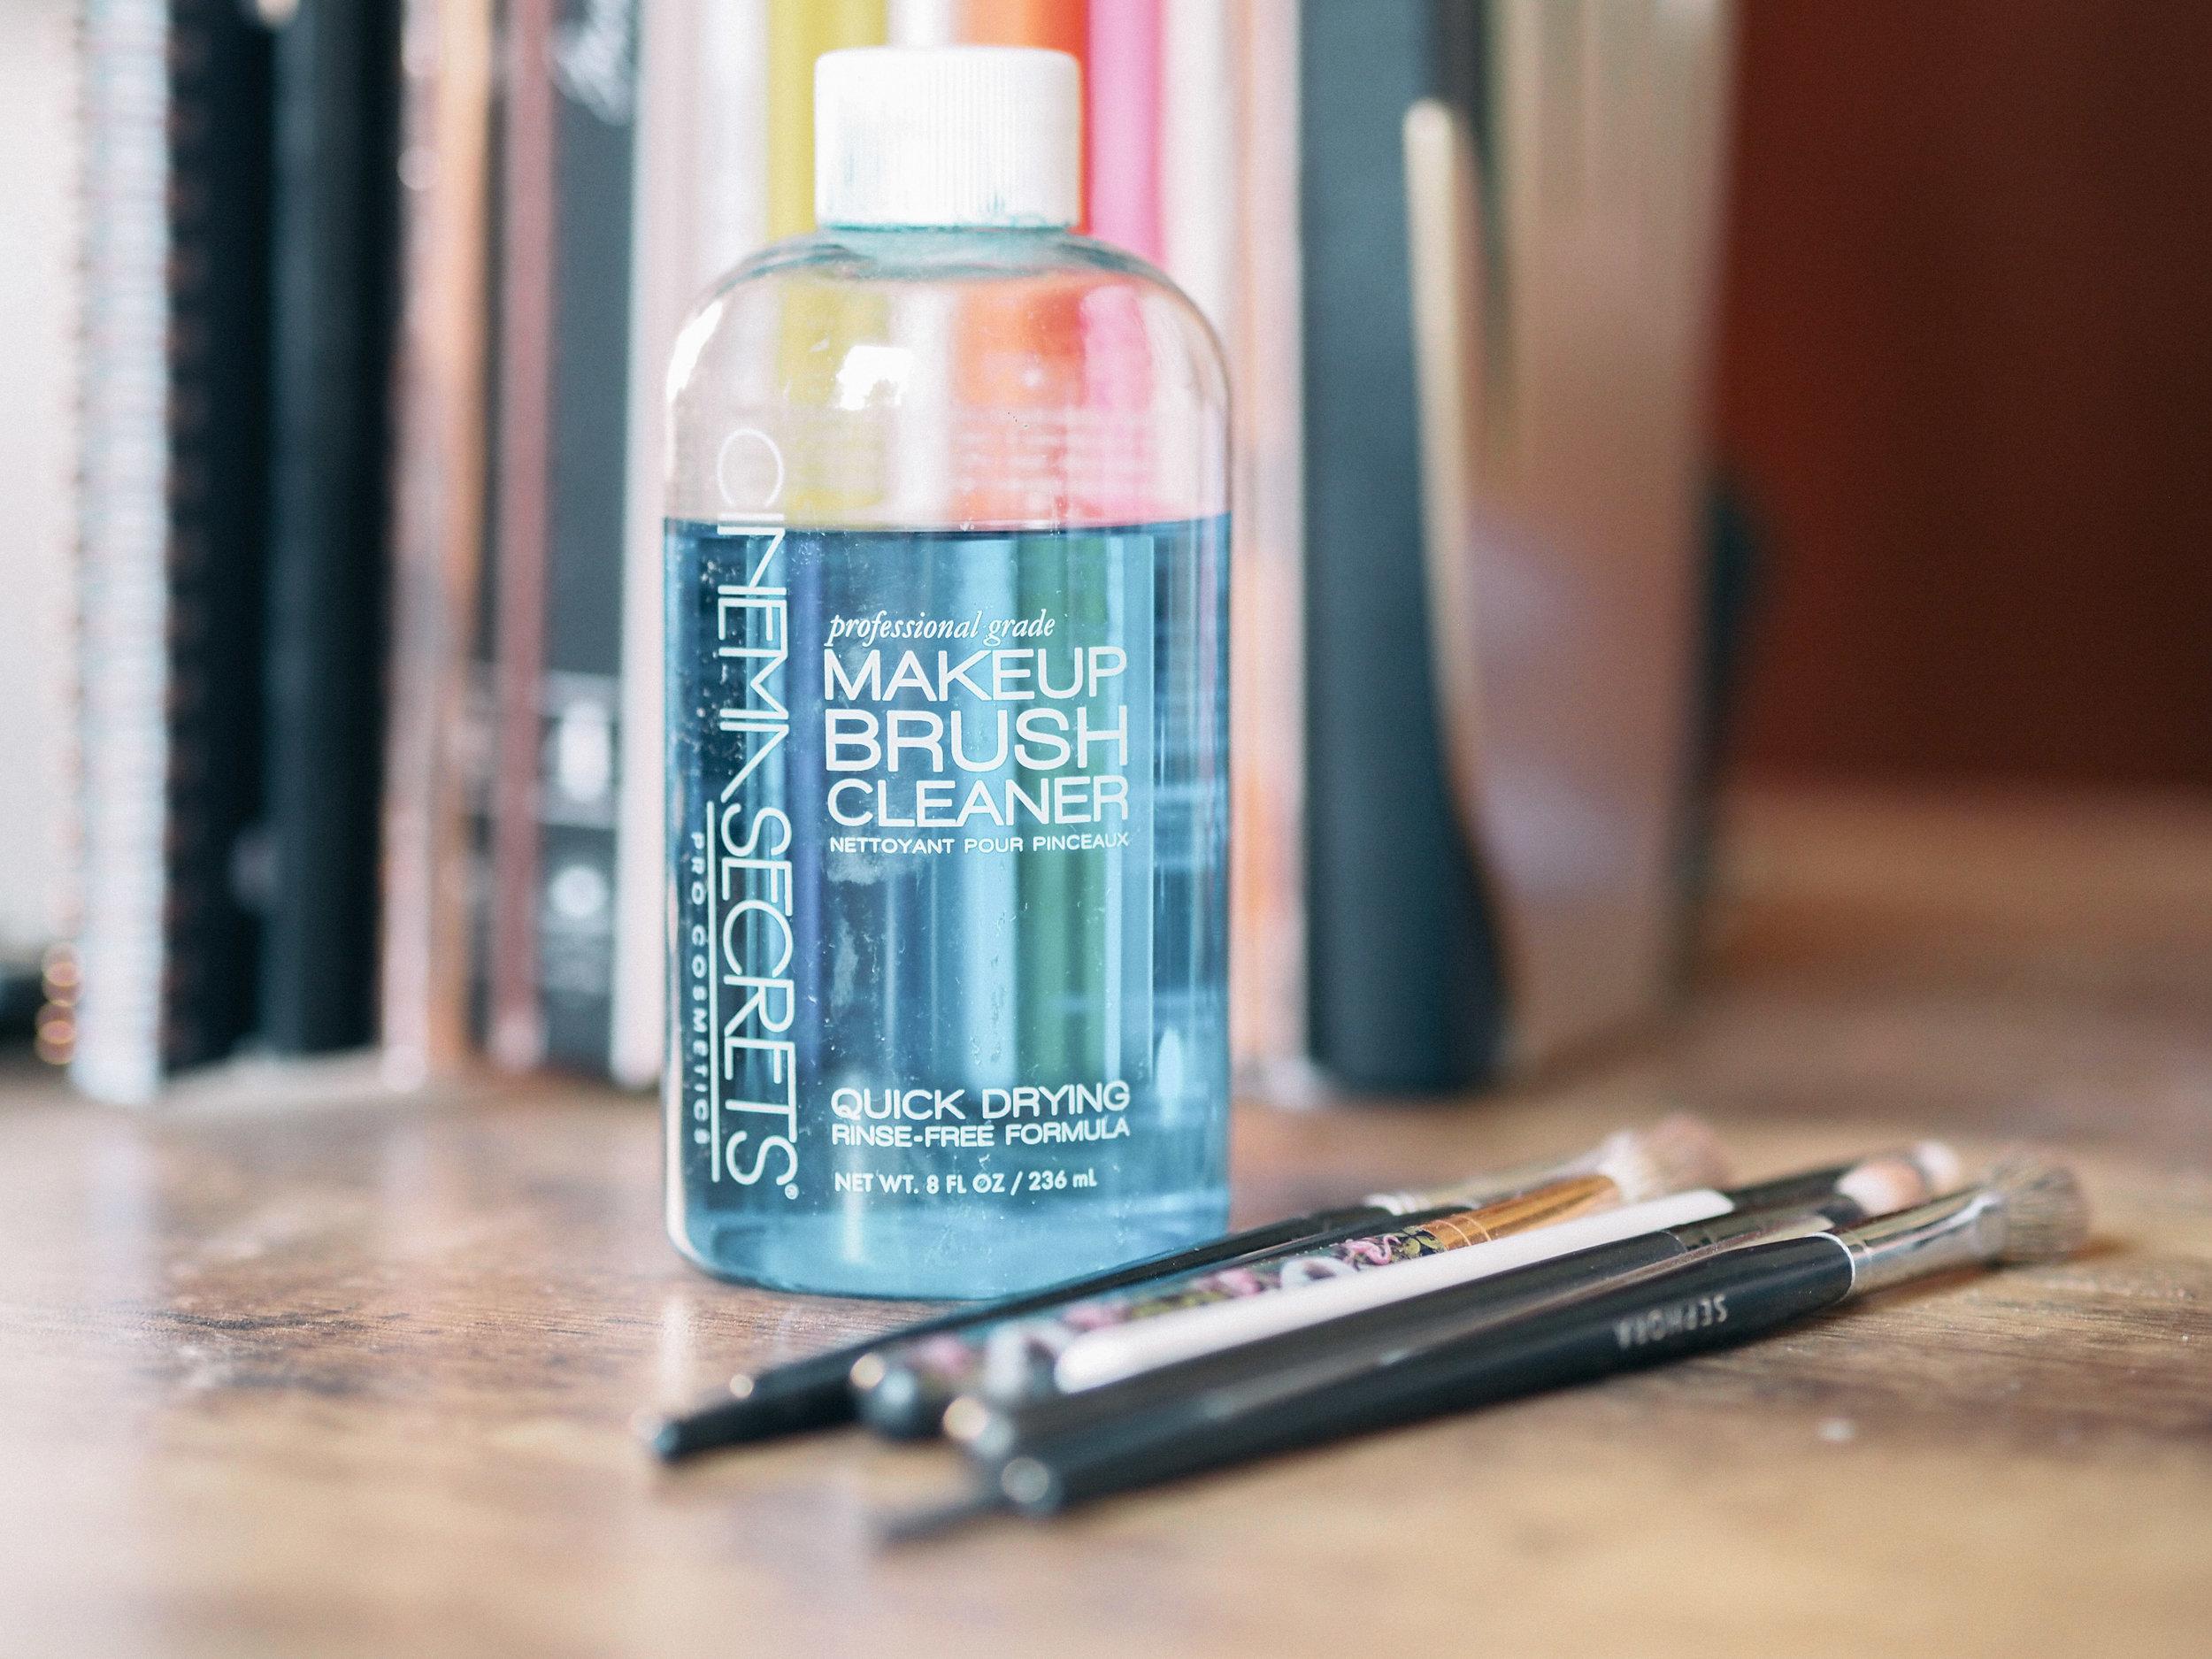 cinema-secrets-makeup-brush-cleaner-review-2.jpg